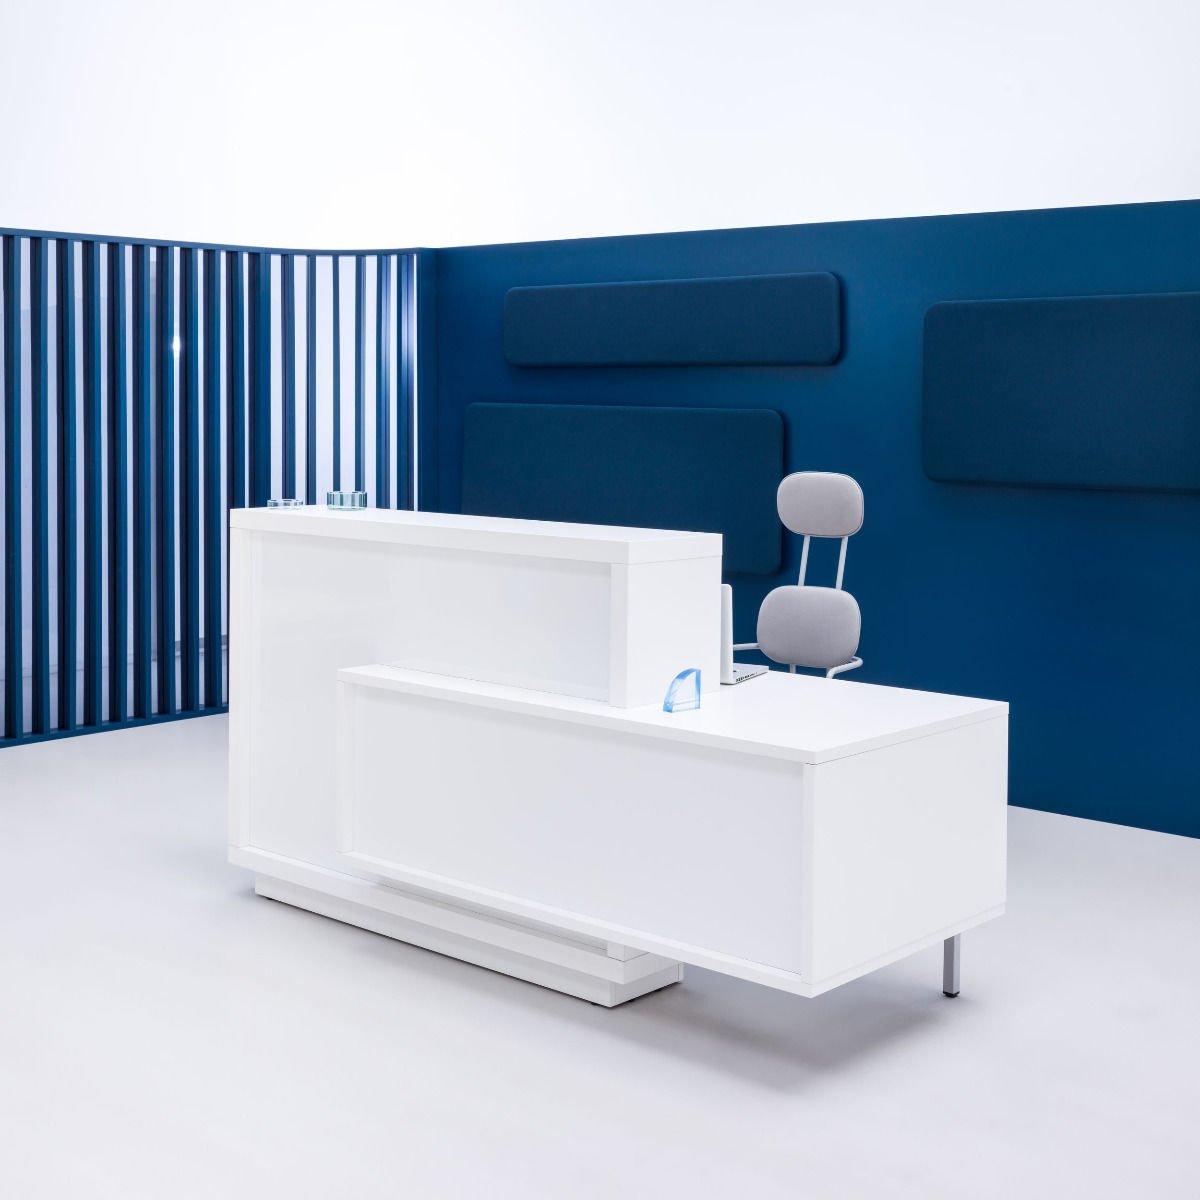 Foro Reception Desk blue background